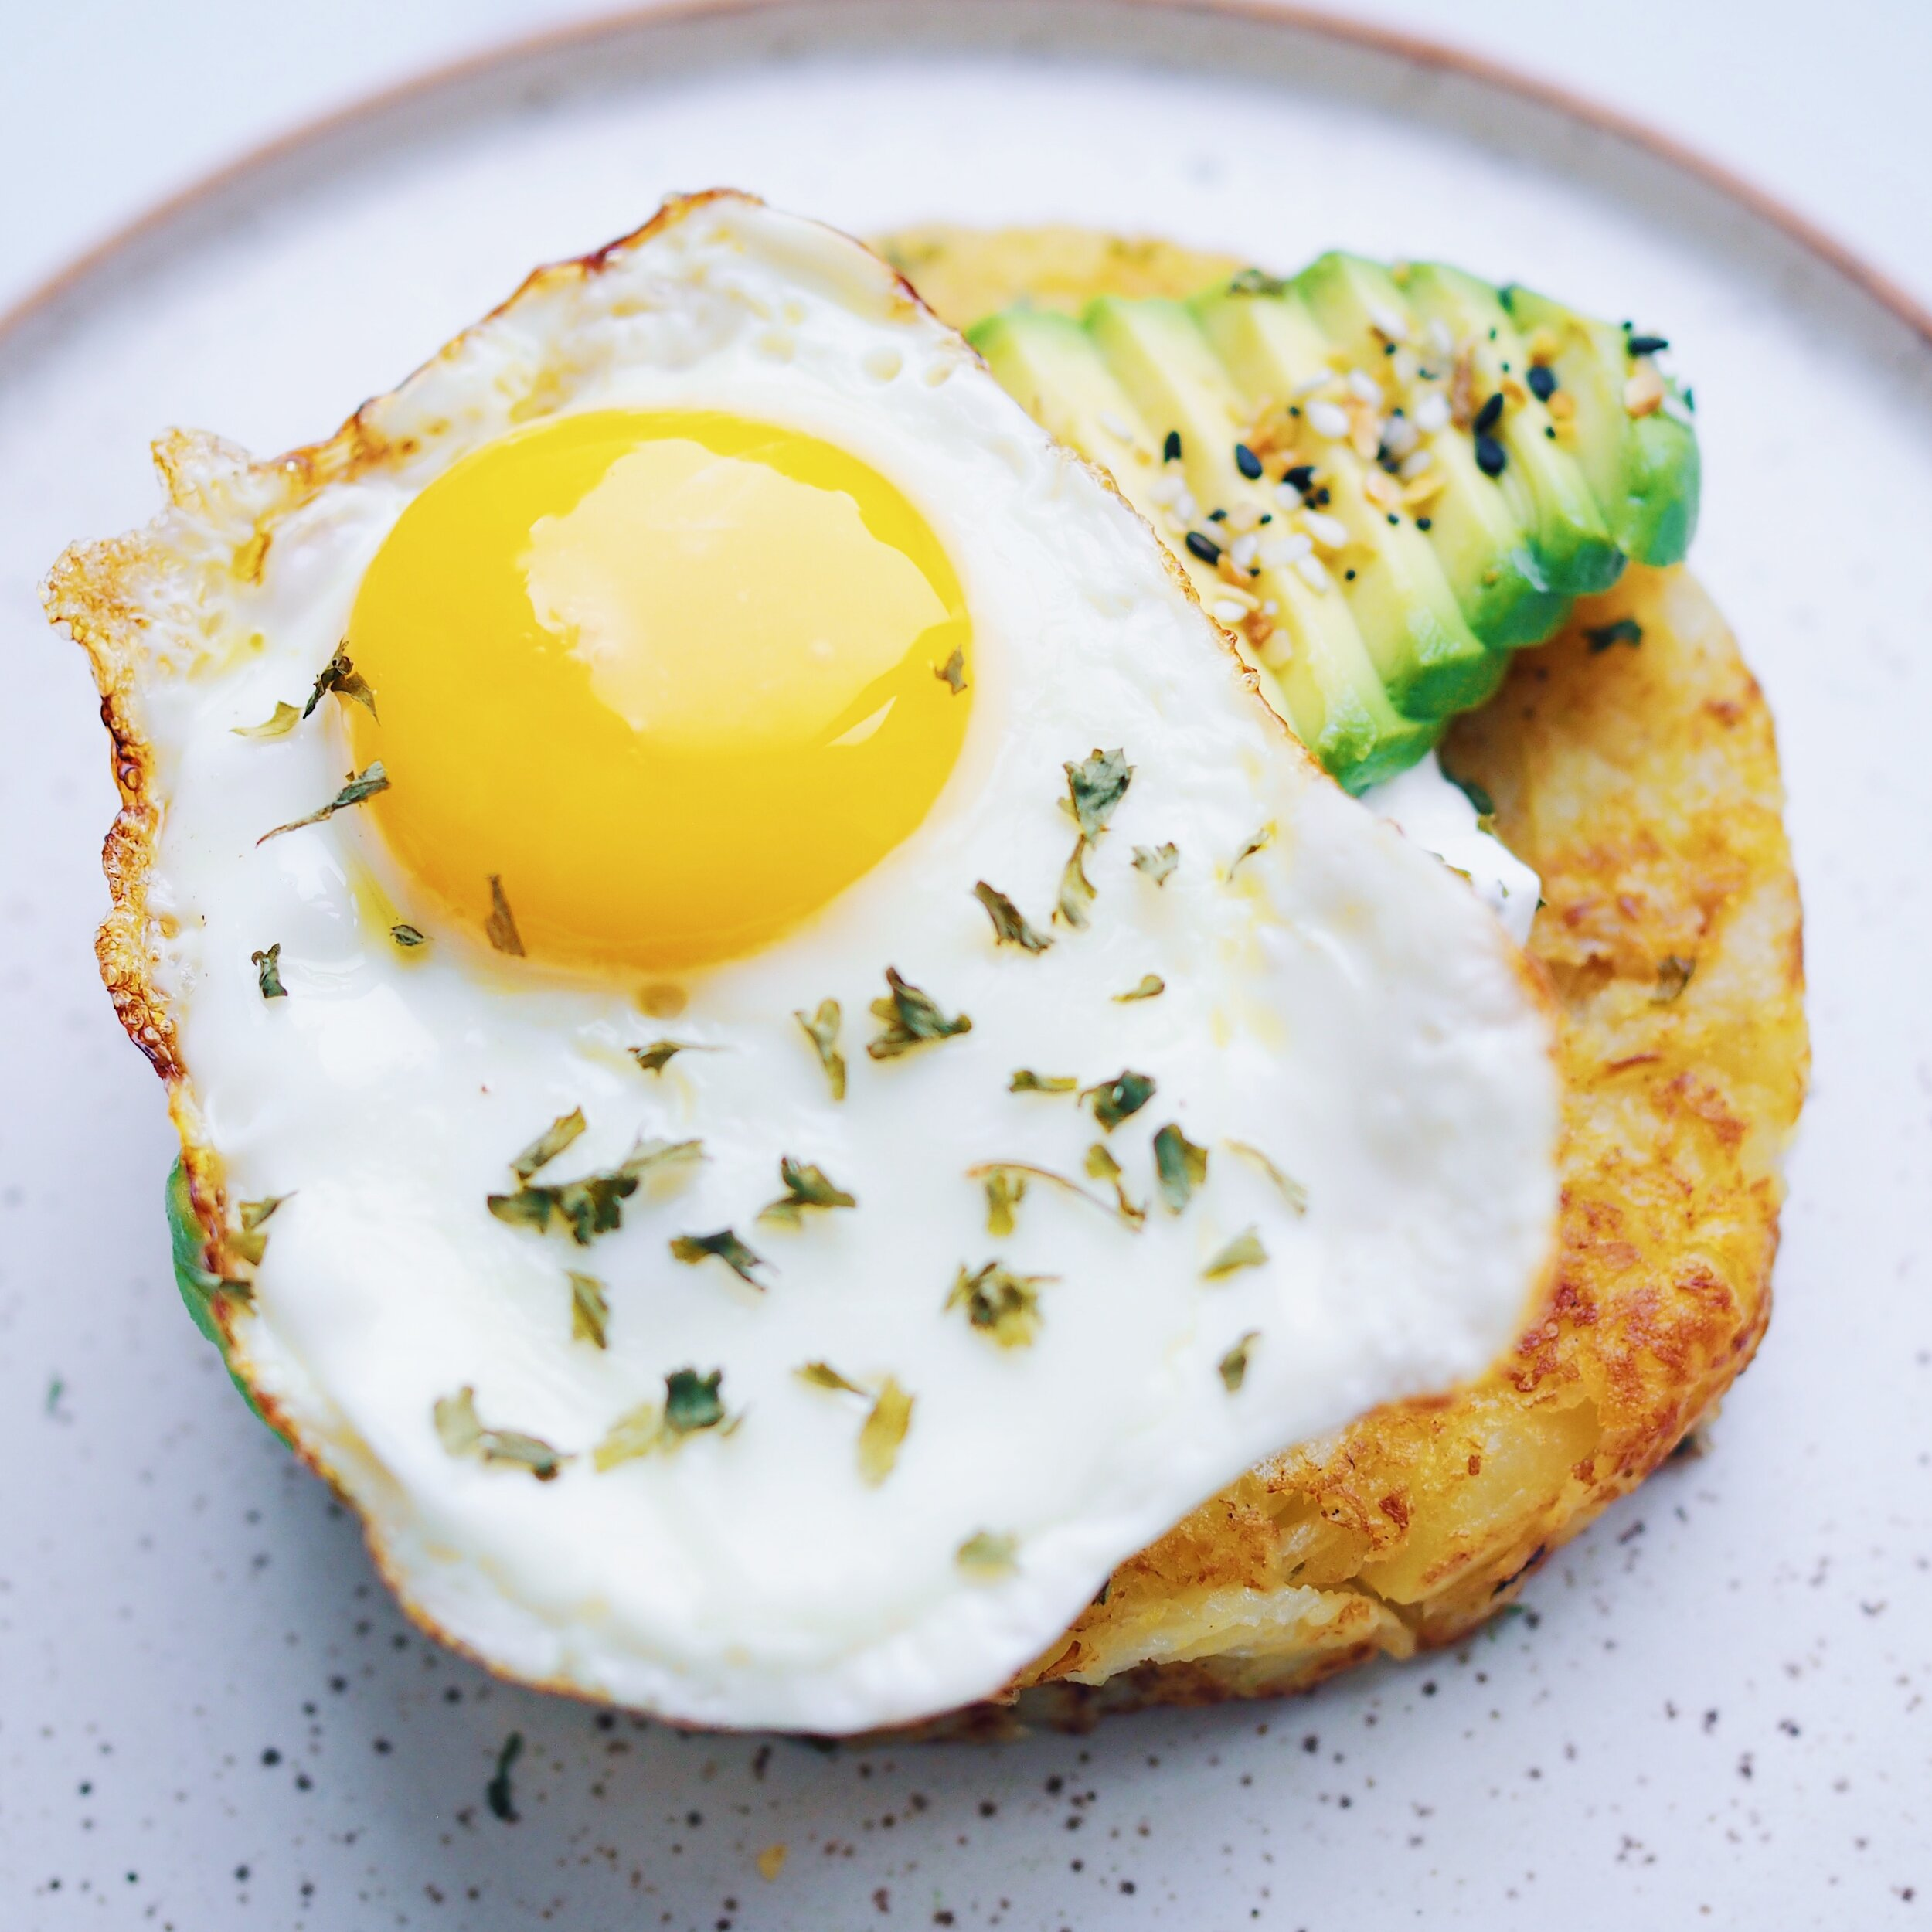 Potato Rosti with Fried Egg